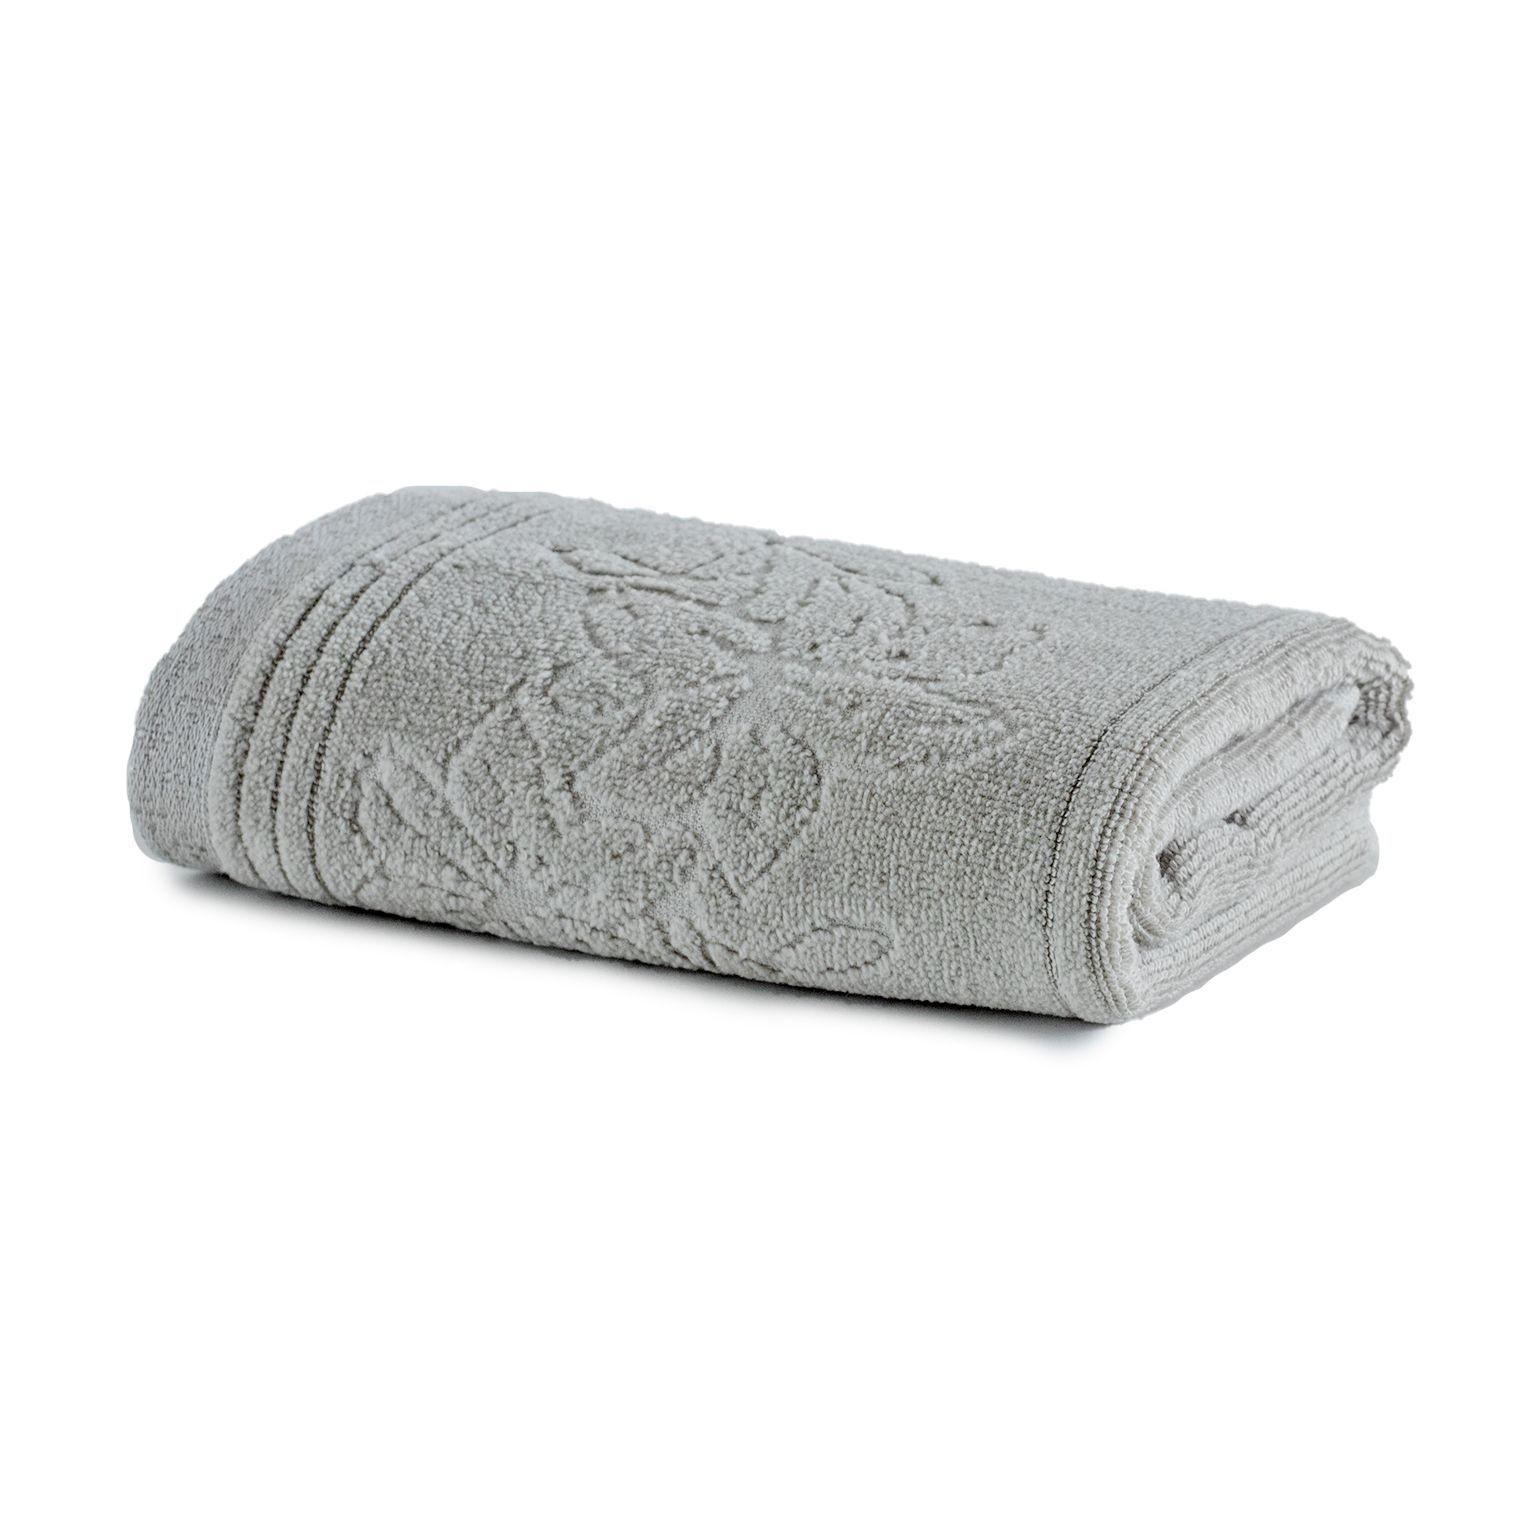 Toalha de Banho Artex Le Bain 100 Algodao 70x140 cm Cinza Claro